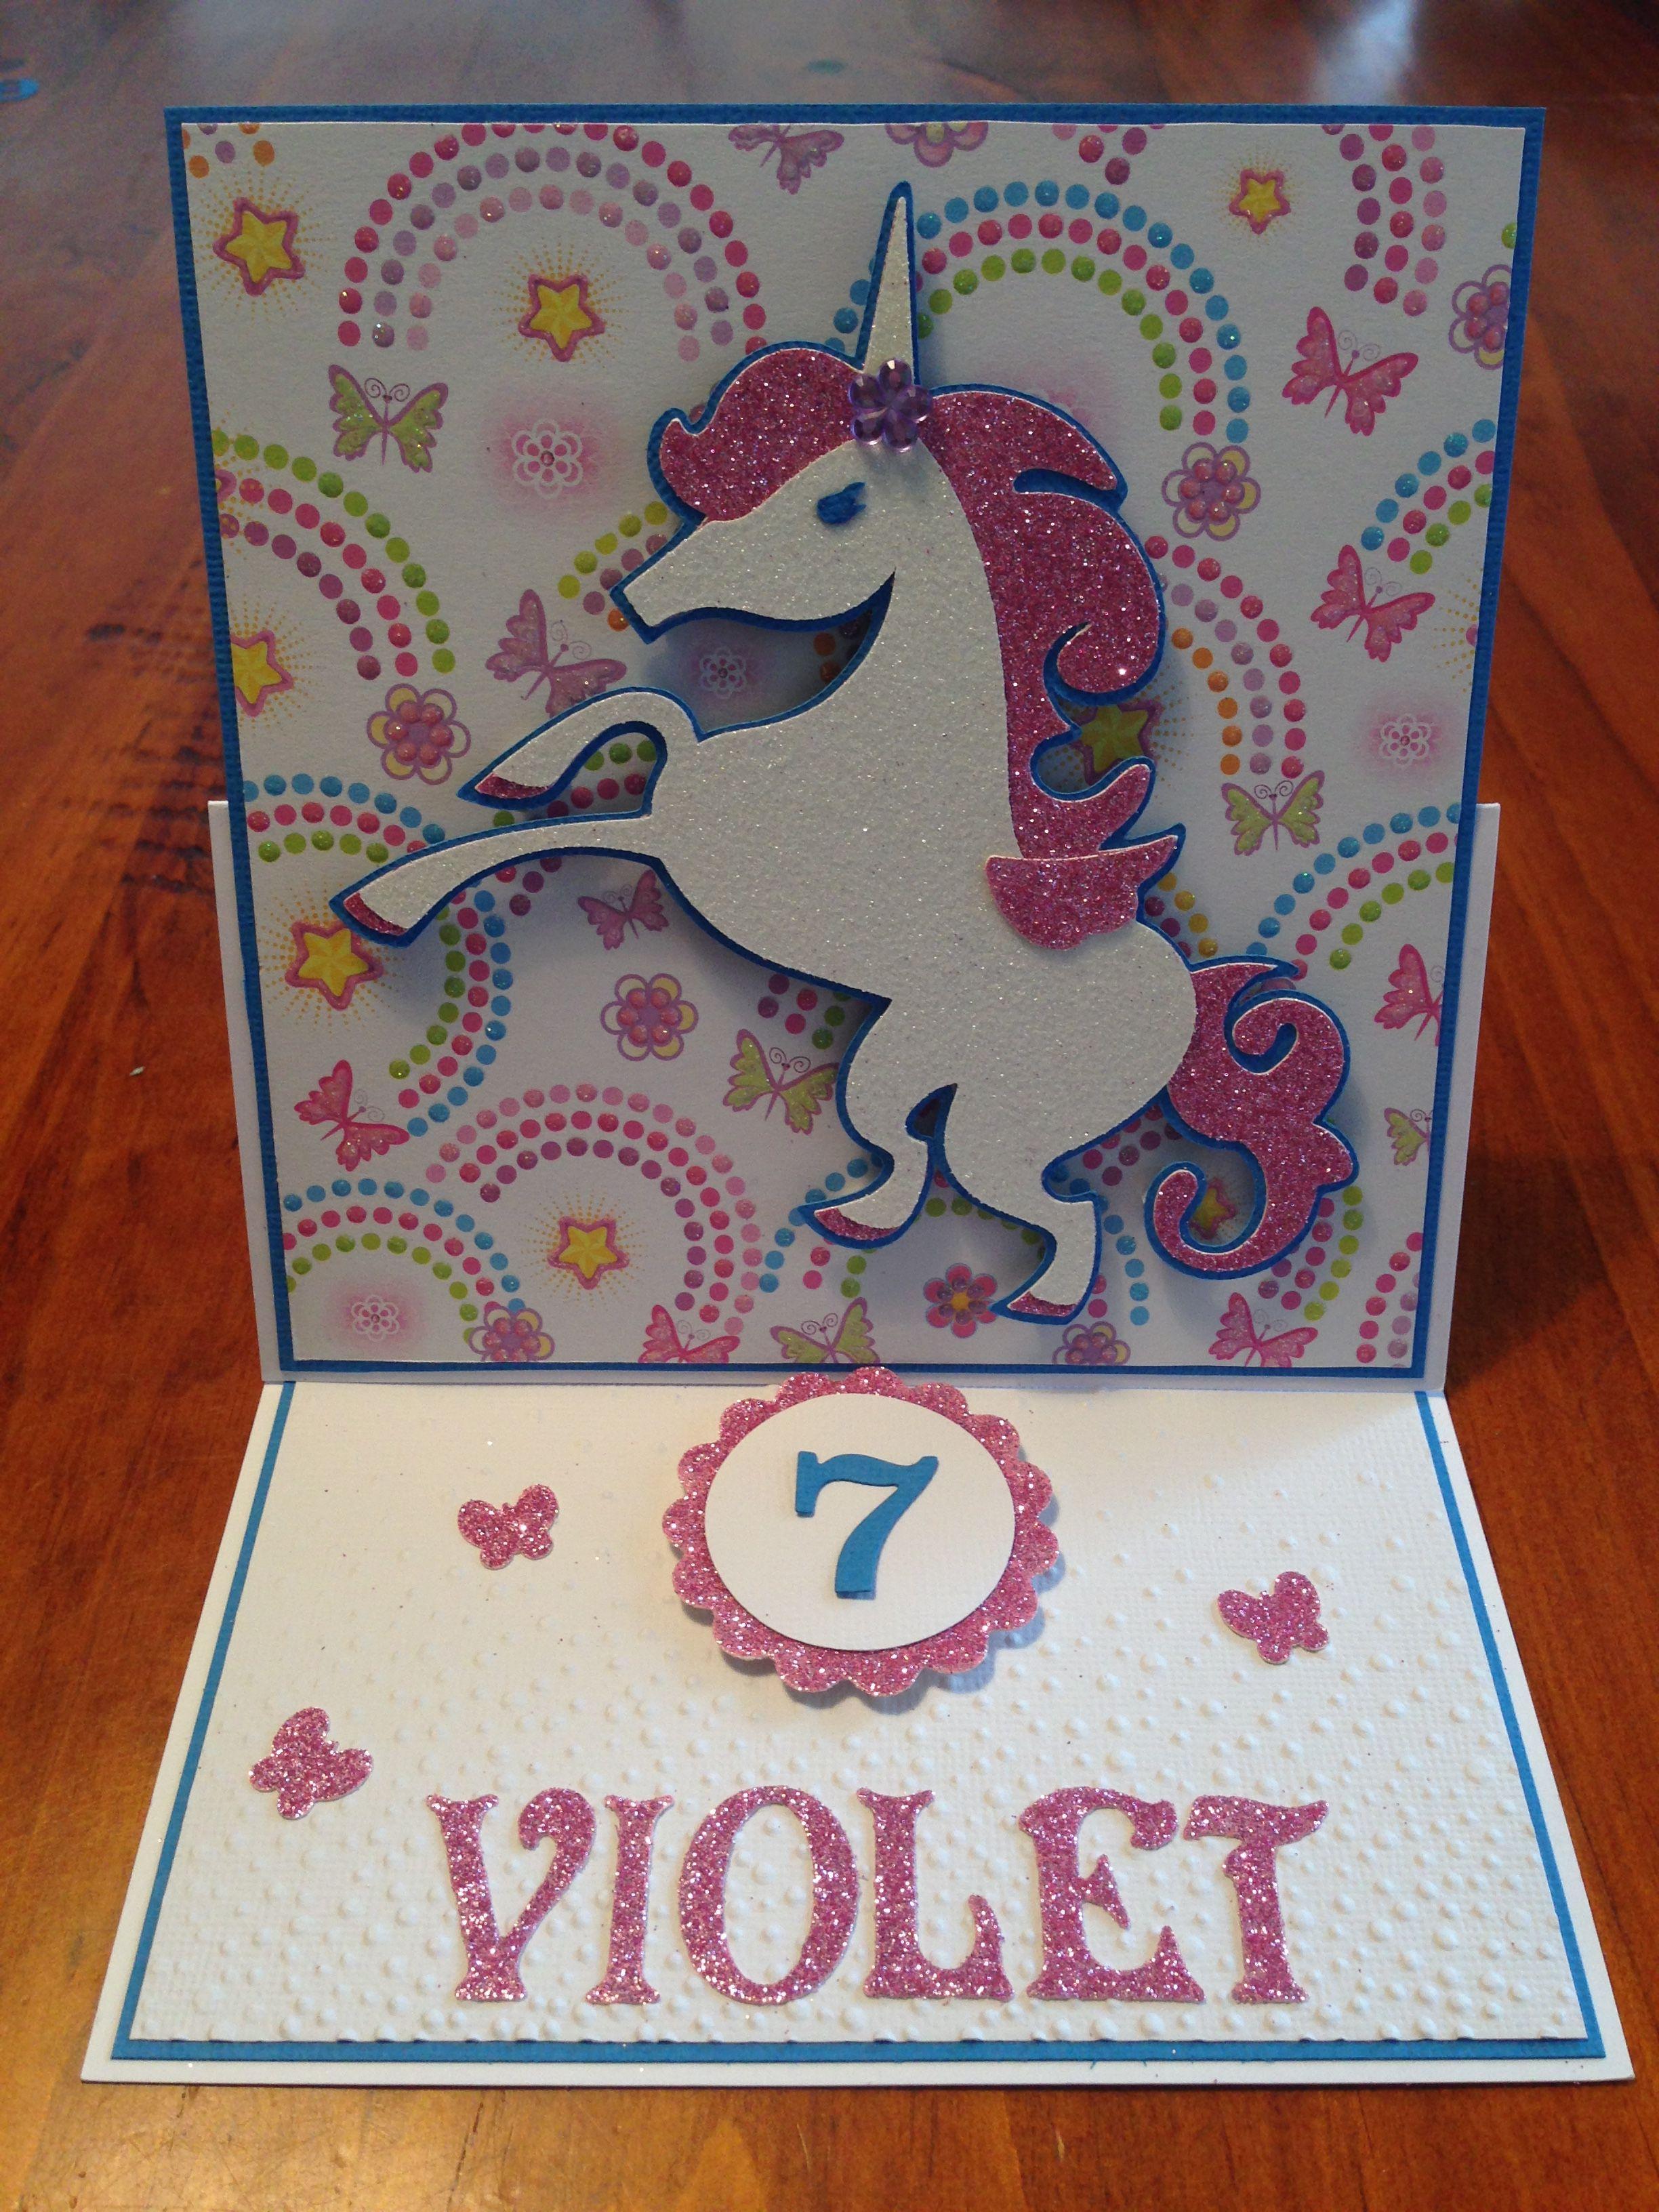 Unicorn Girls Birthday Card Cricut Unicorn Birthday Cards Girl Birthday Cards Handmade Card Making